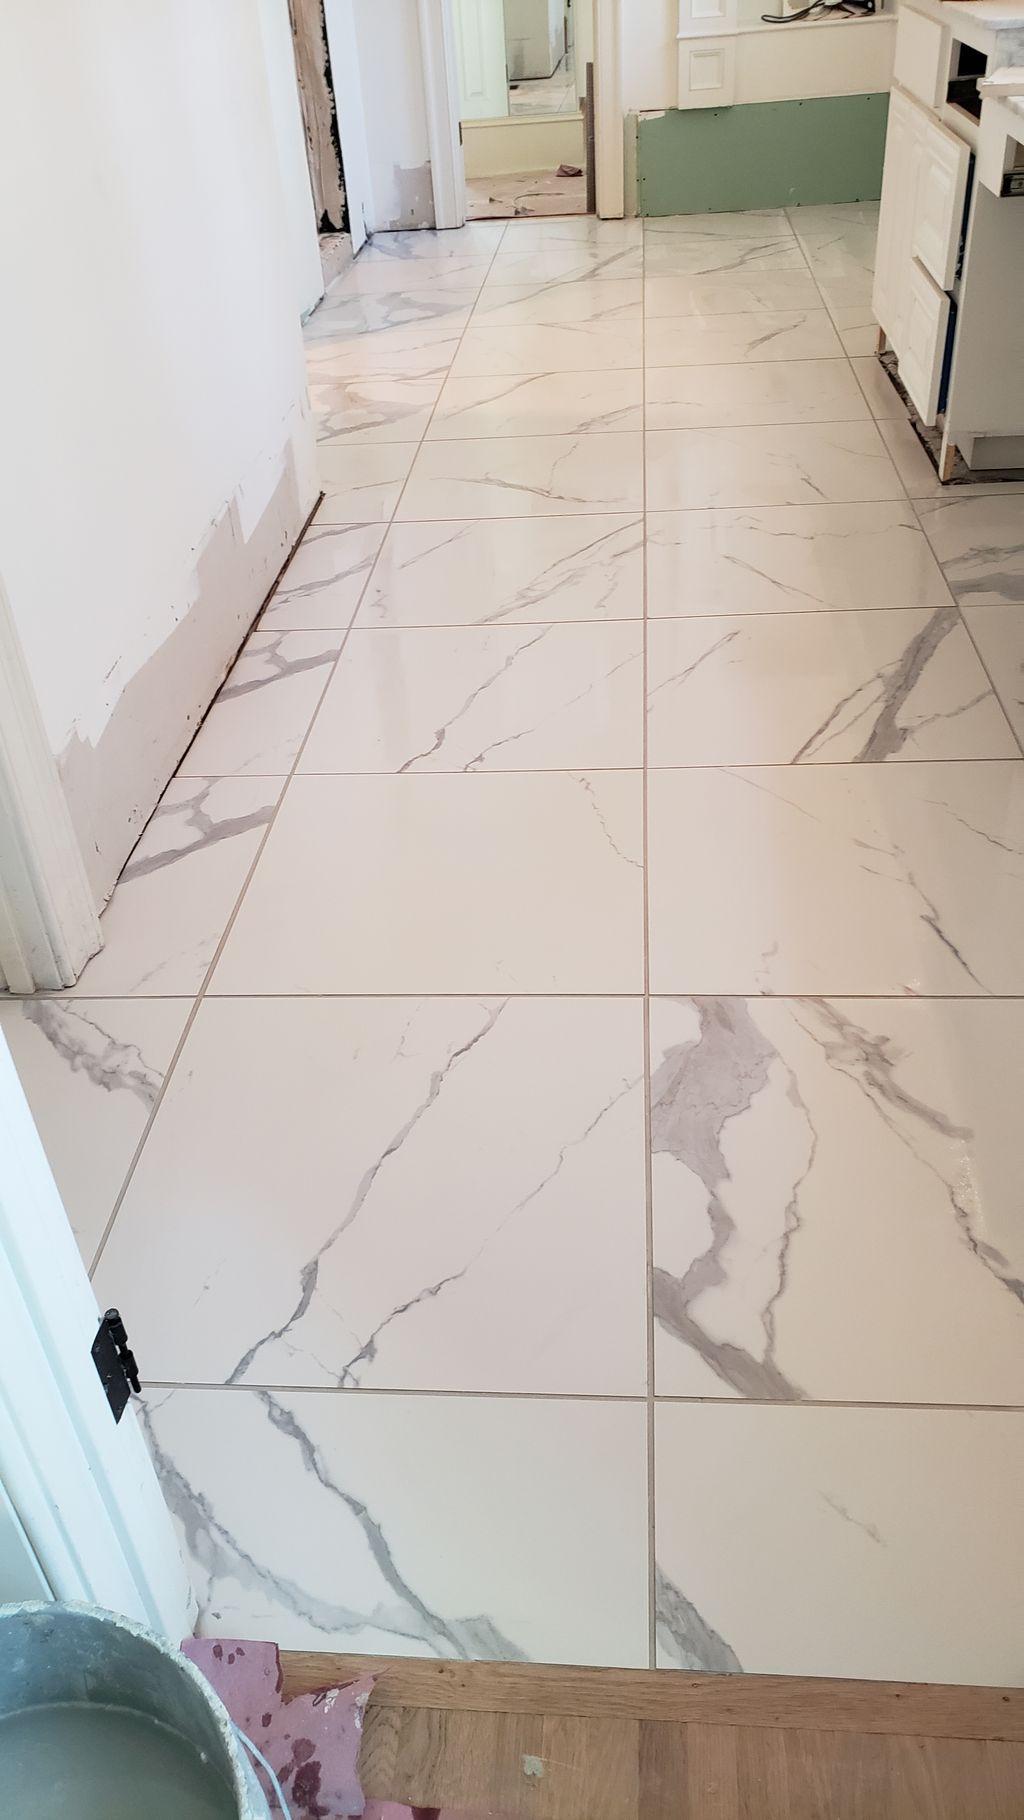 Shower and floor